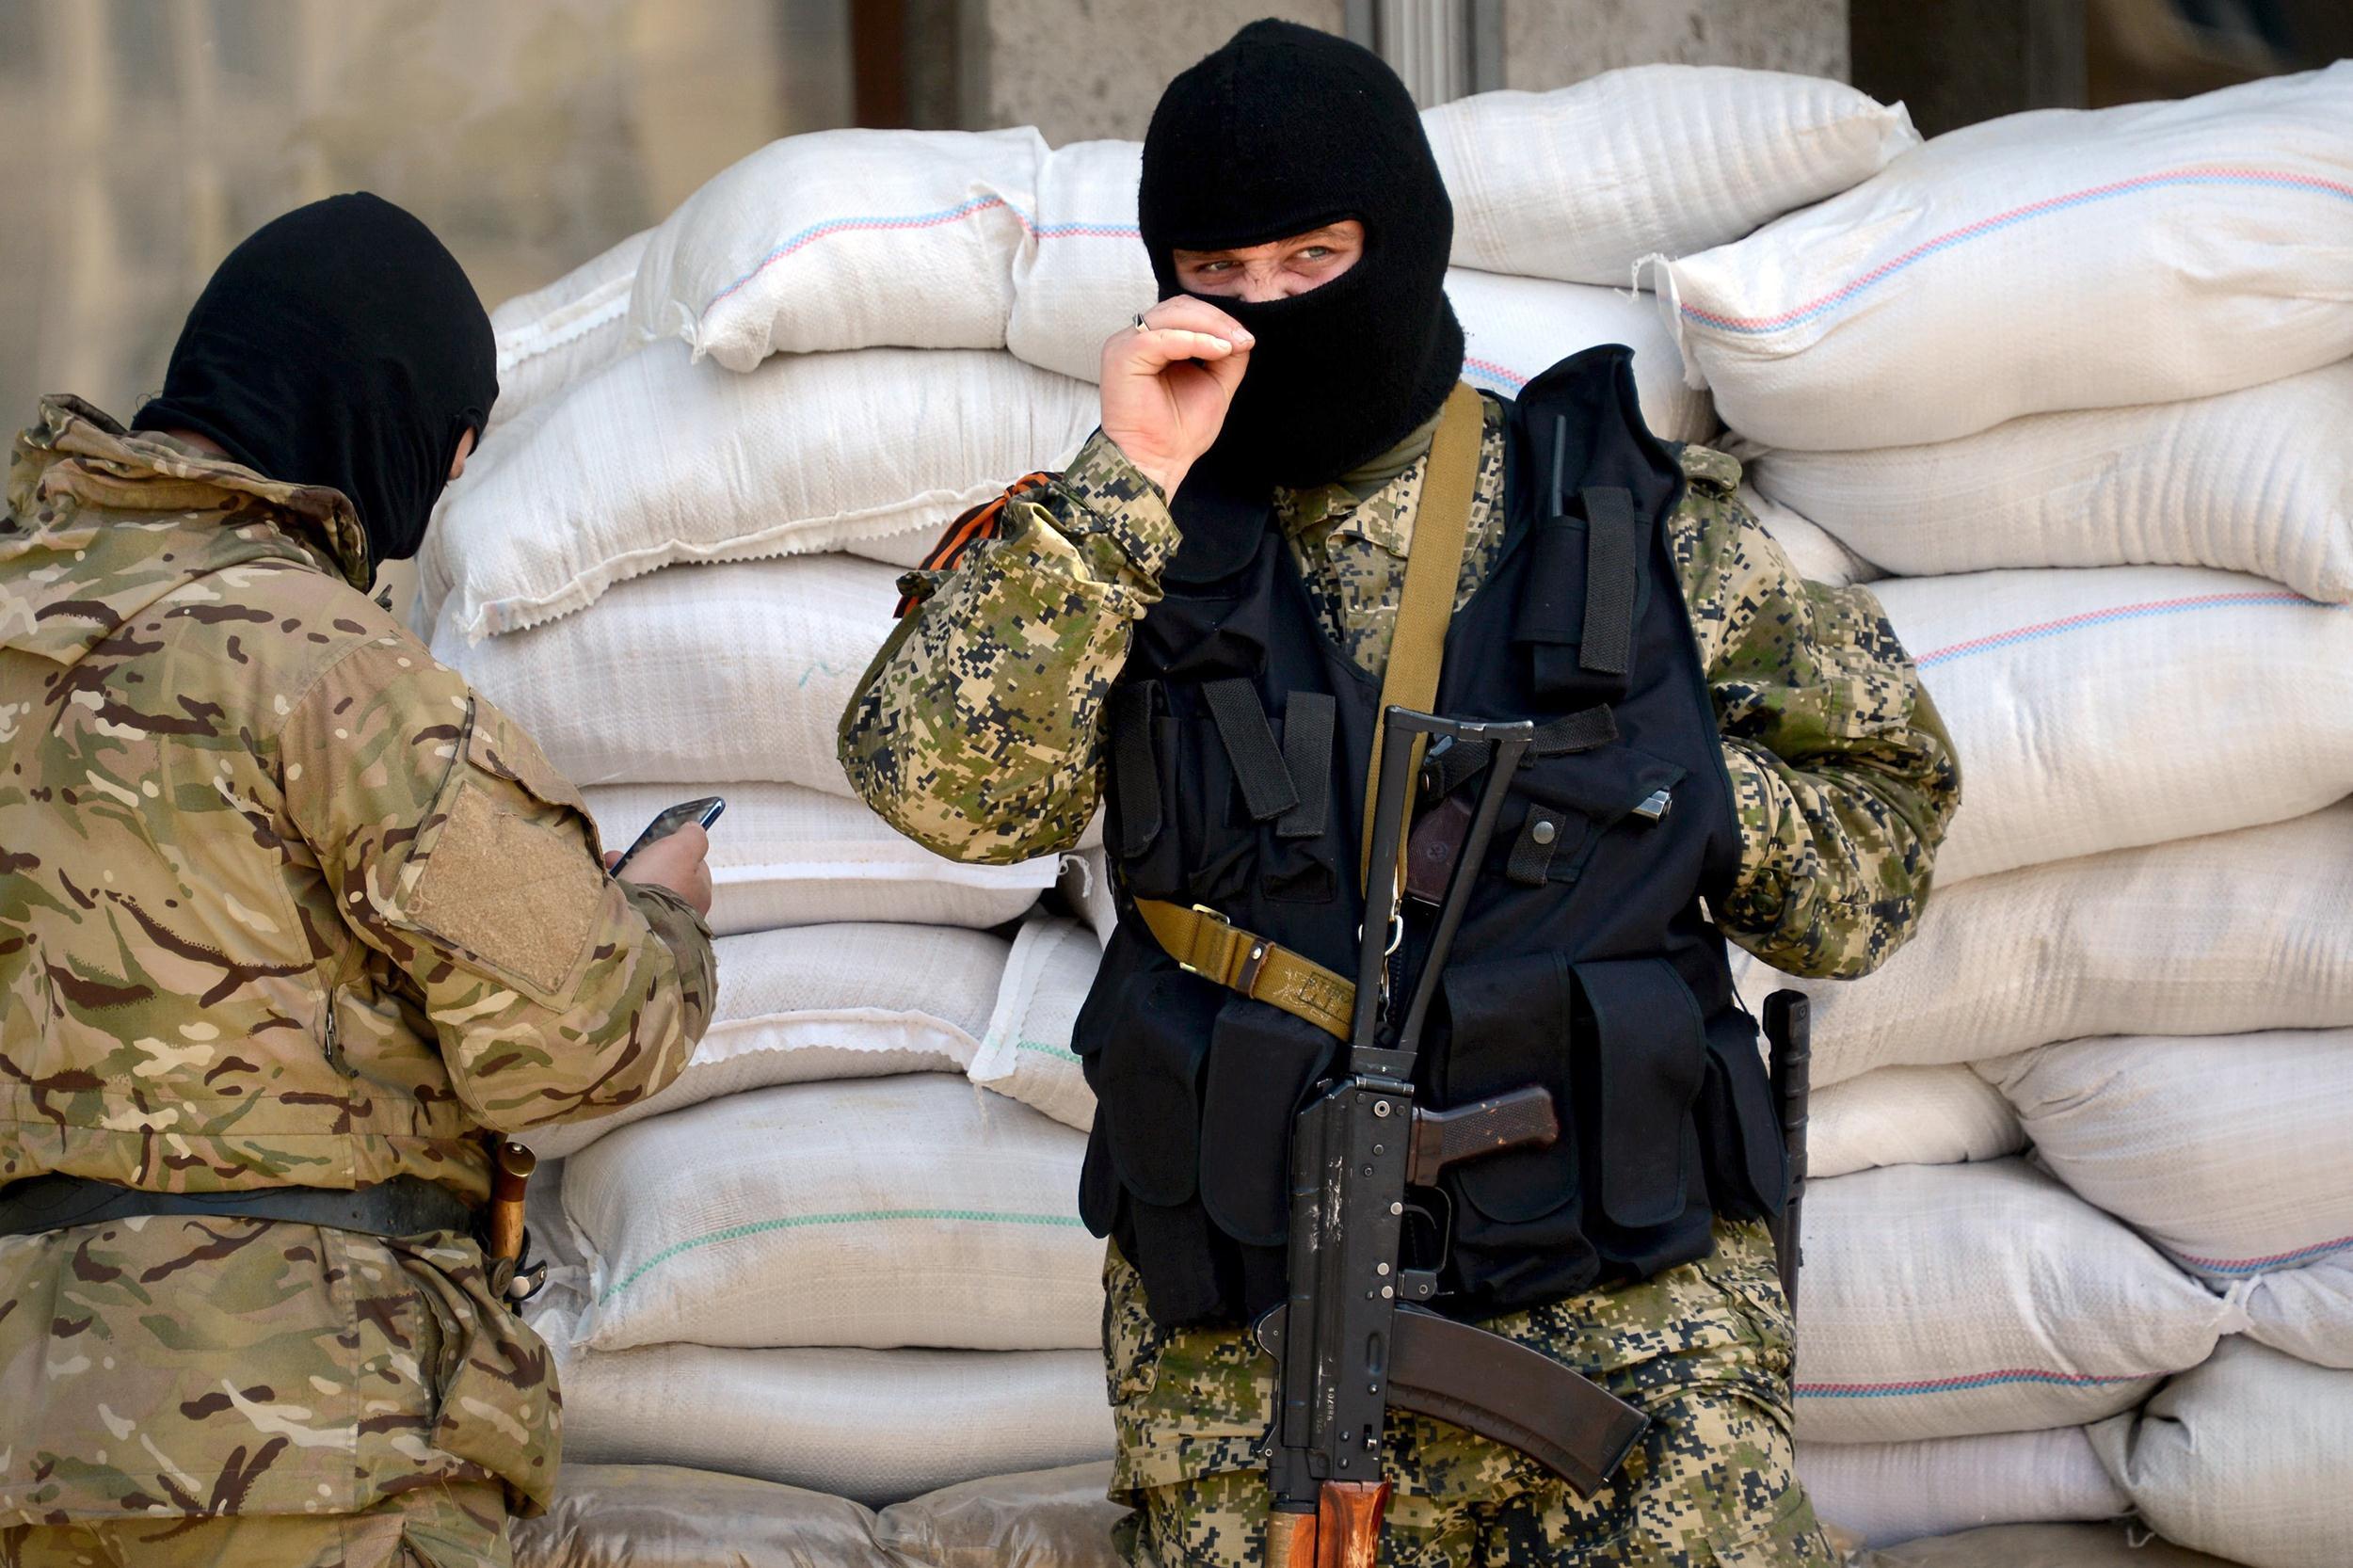 Image: Pro-Russian separatists in eastern Ukraine